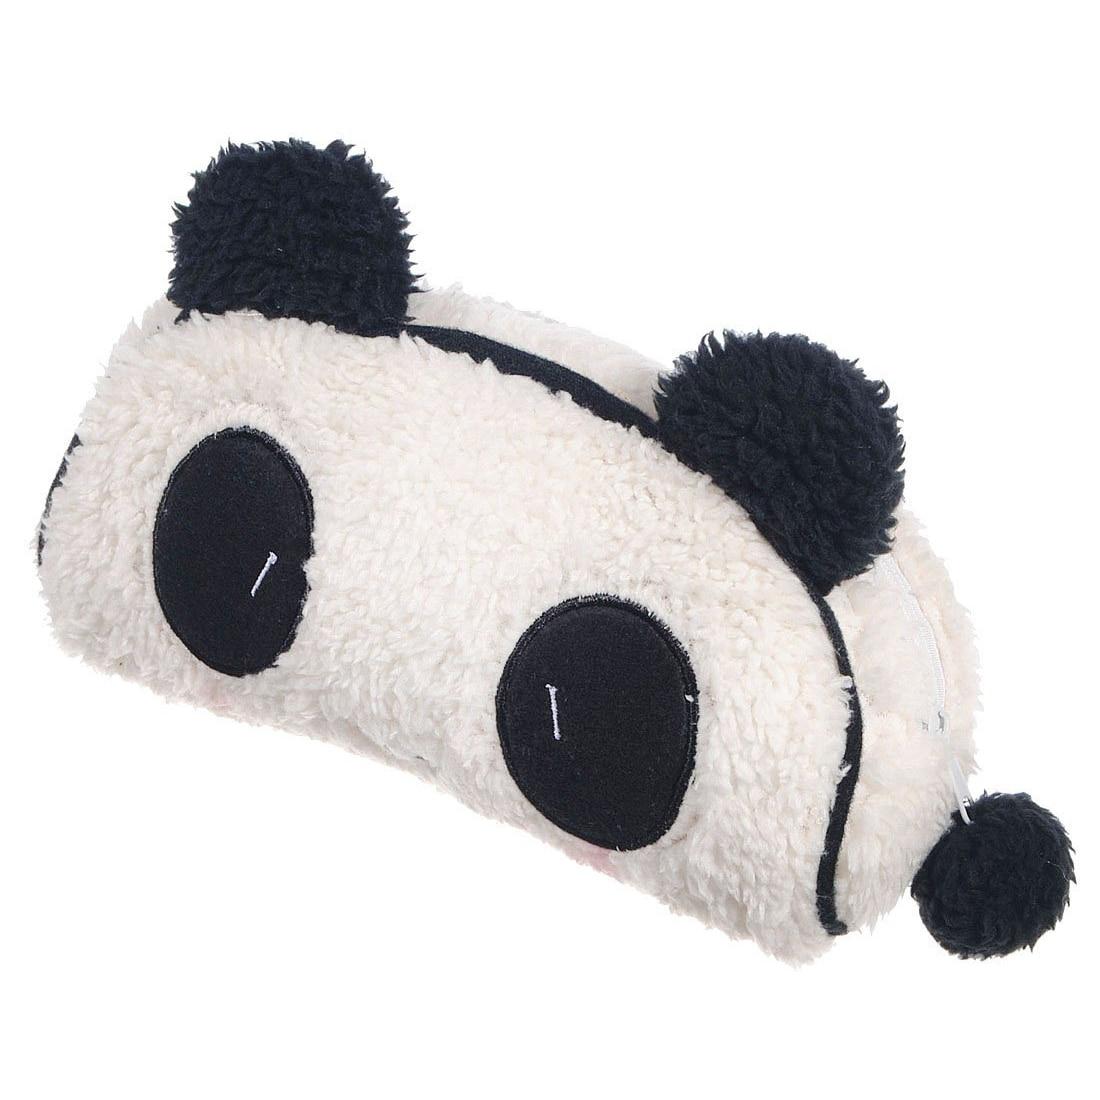 SCYL Soft Plush Panda Pencil Phone Card Case Cosmetic Makeup Bag Pouch Purse 2016 watermelon plush key coin wallet purse cosmetic makeup pouch phone pencil pen bag carteira 9ij3